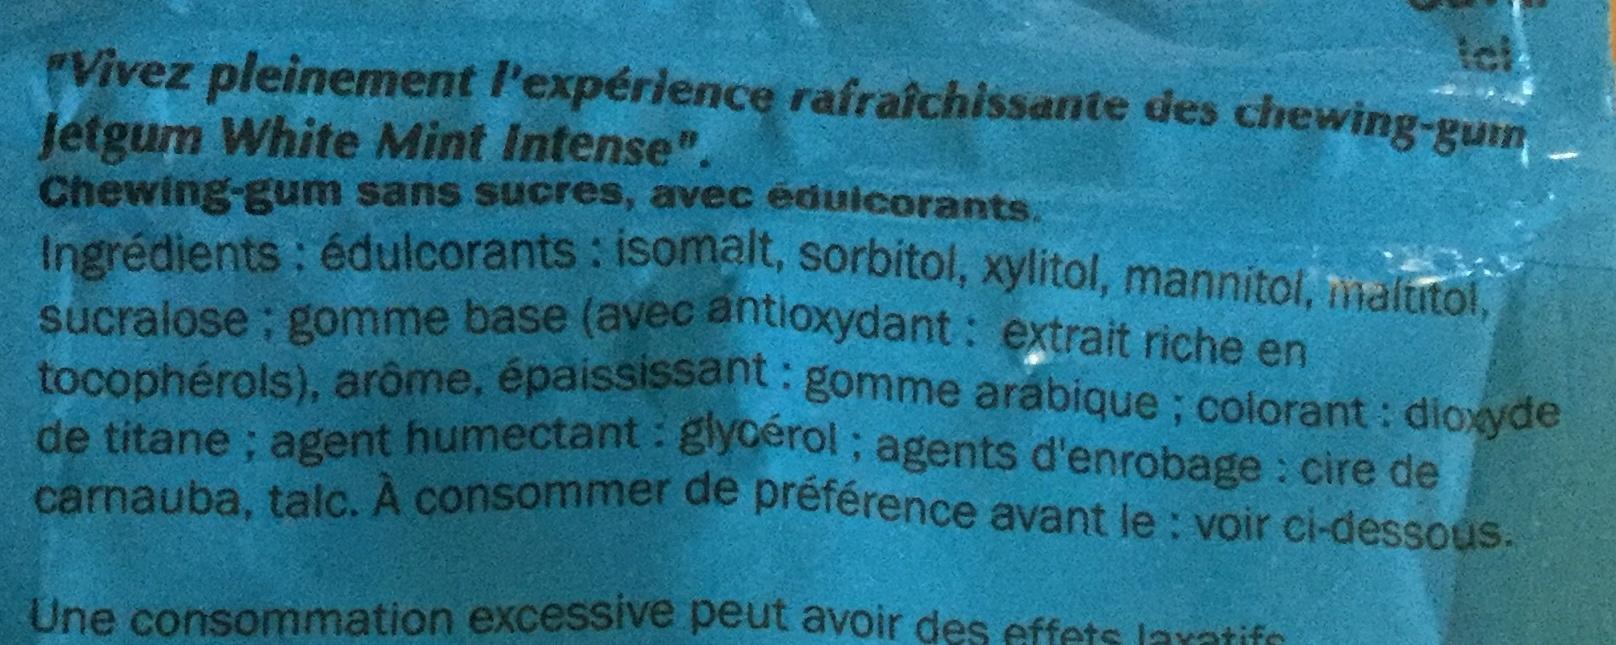 Jetgum - Ingrédients - fr